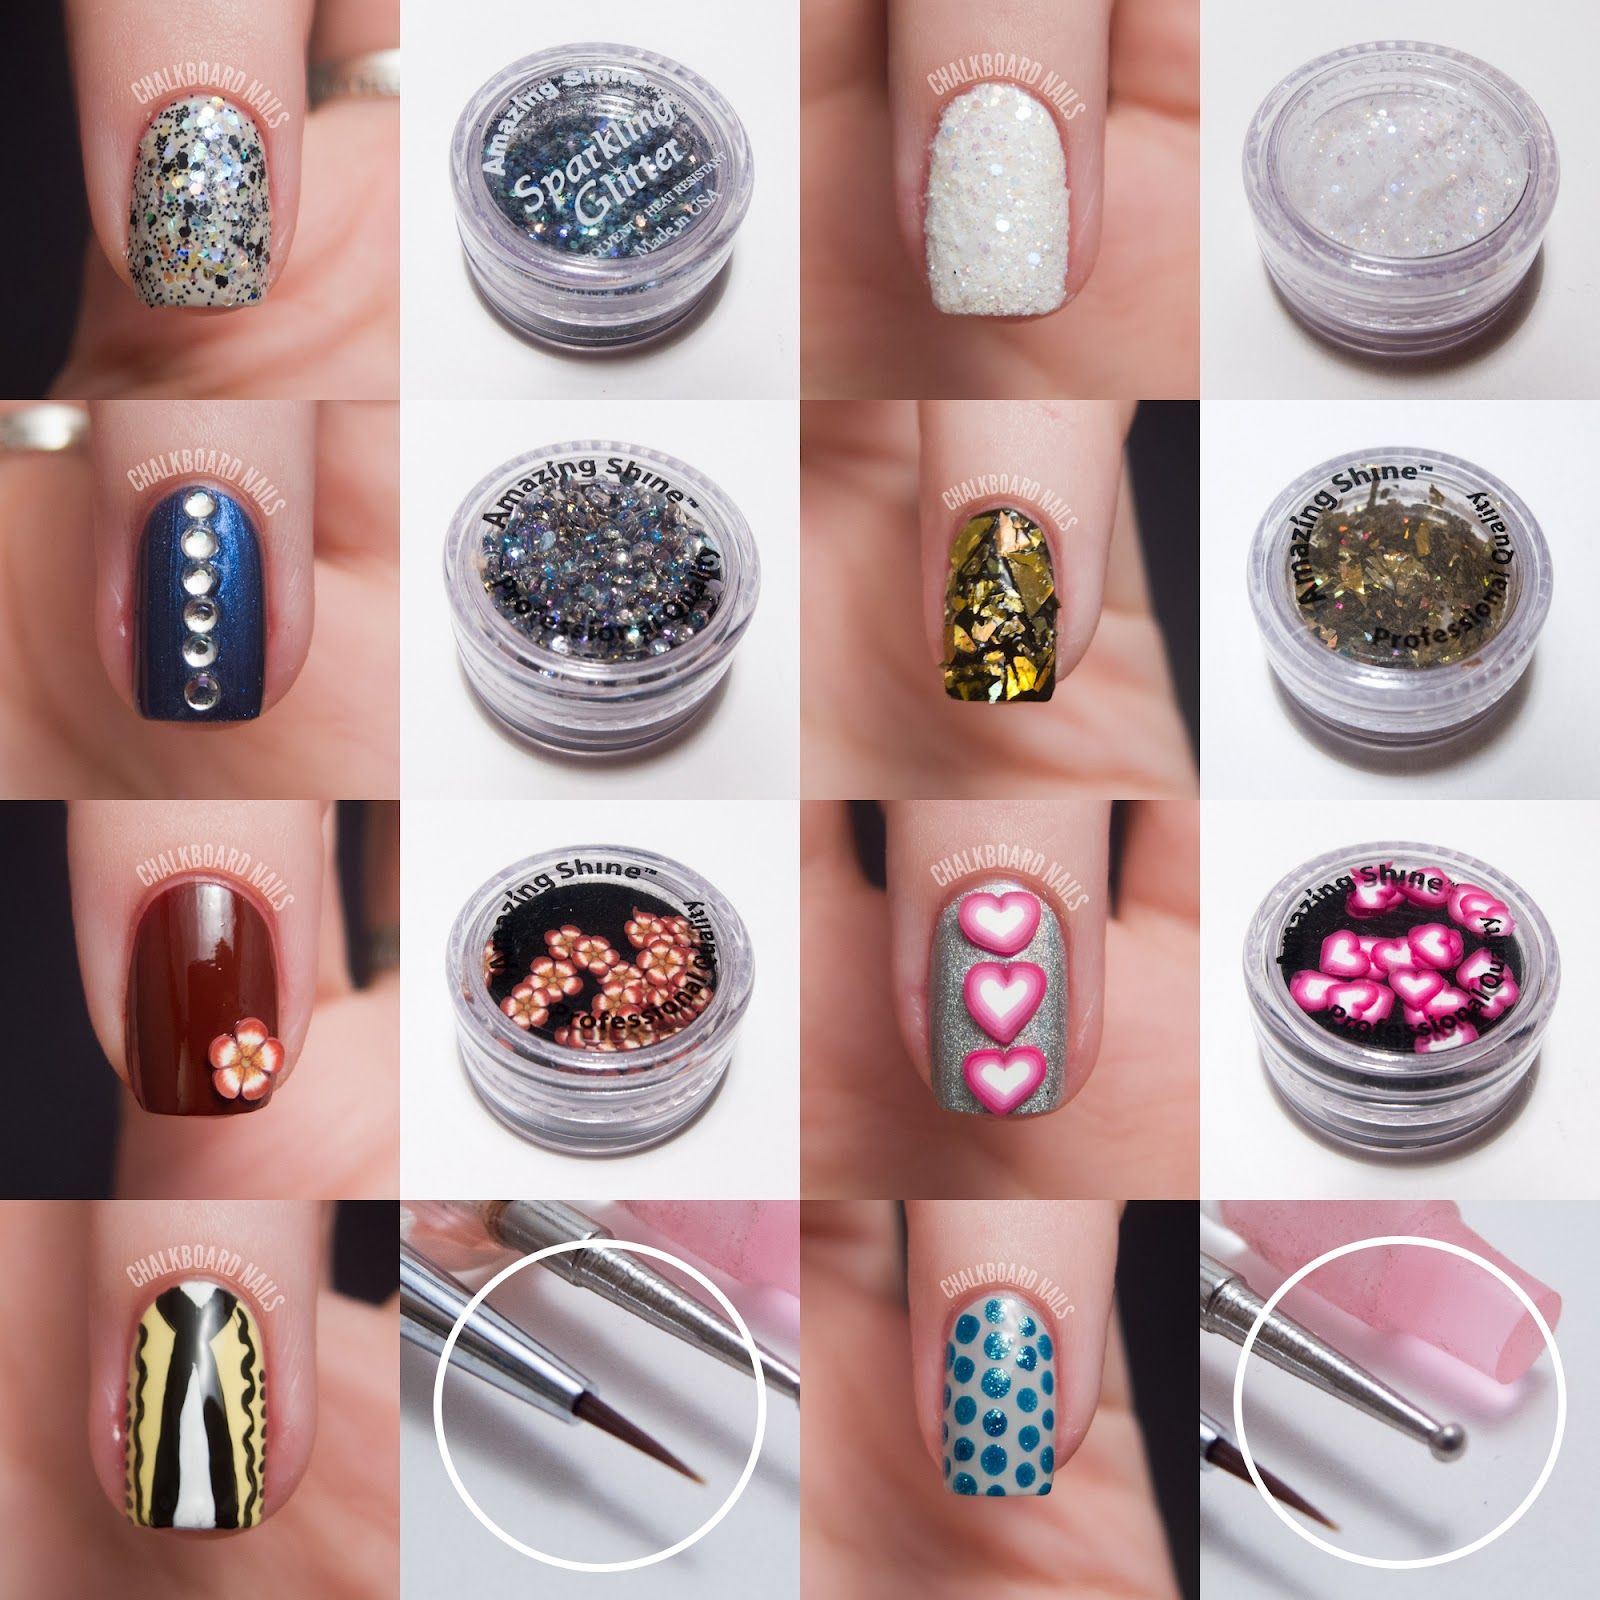 Amazing Shine Nail Art Kit Review | Nail art kits, Chalkboard nails ...